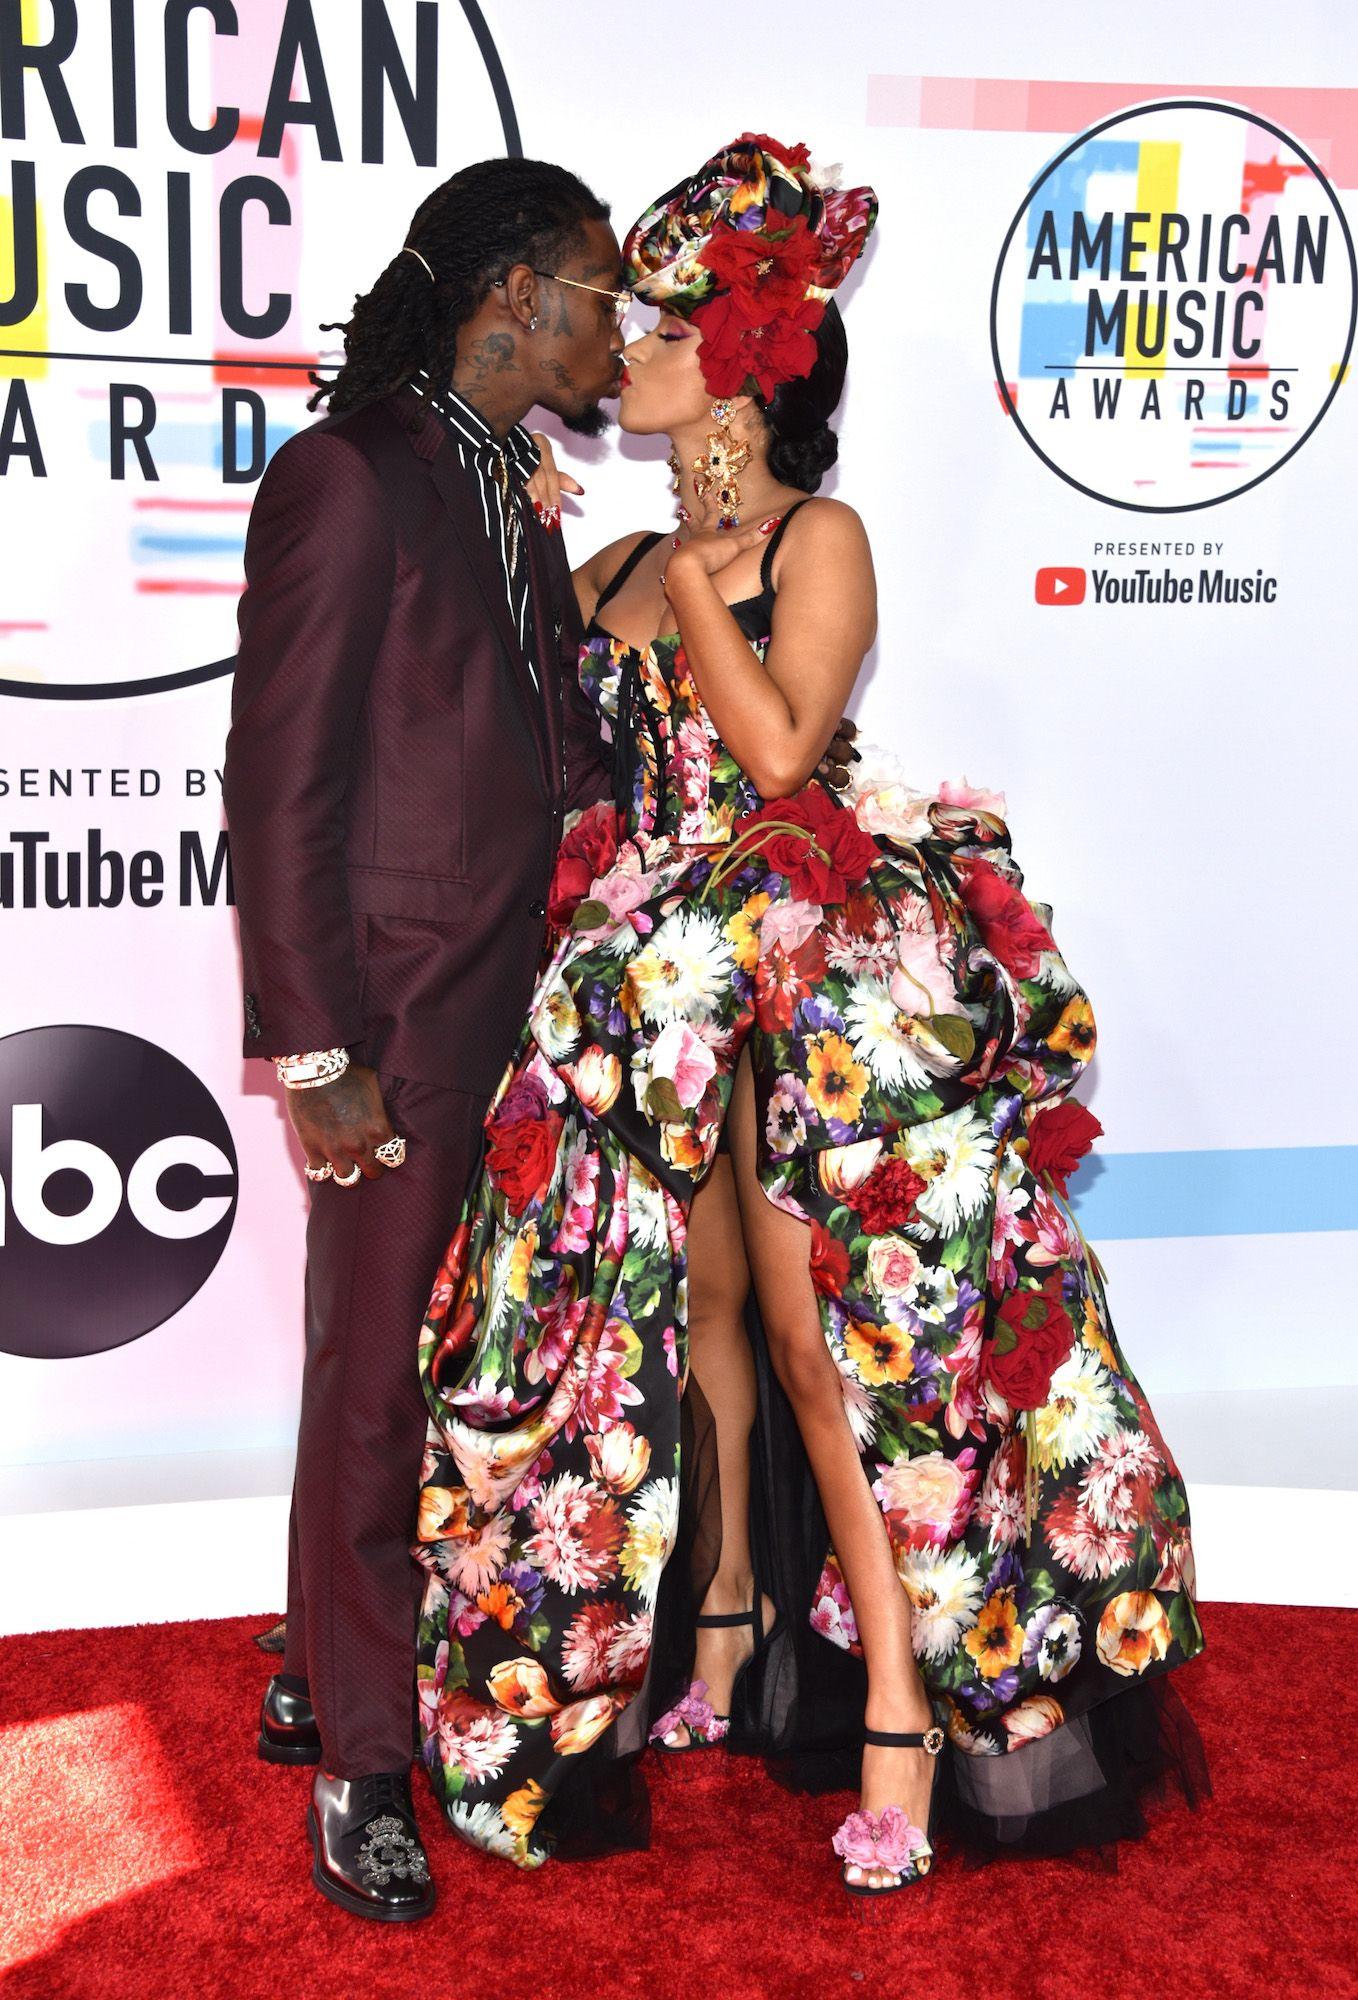 2018 American Music Awards Couples Cardi B Offset